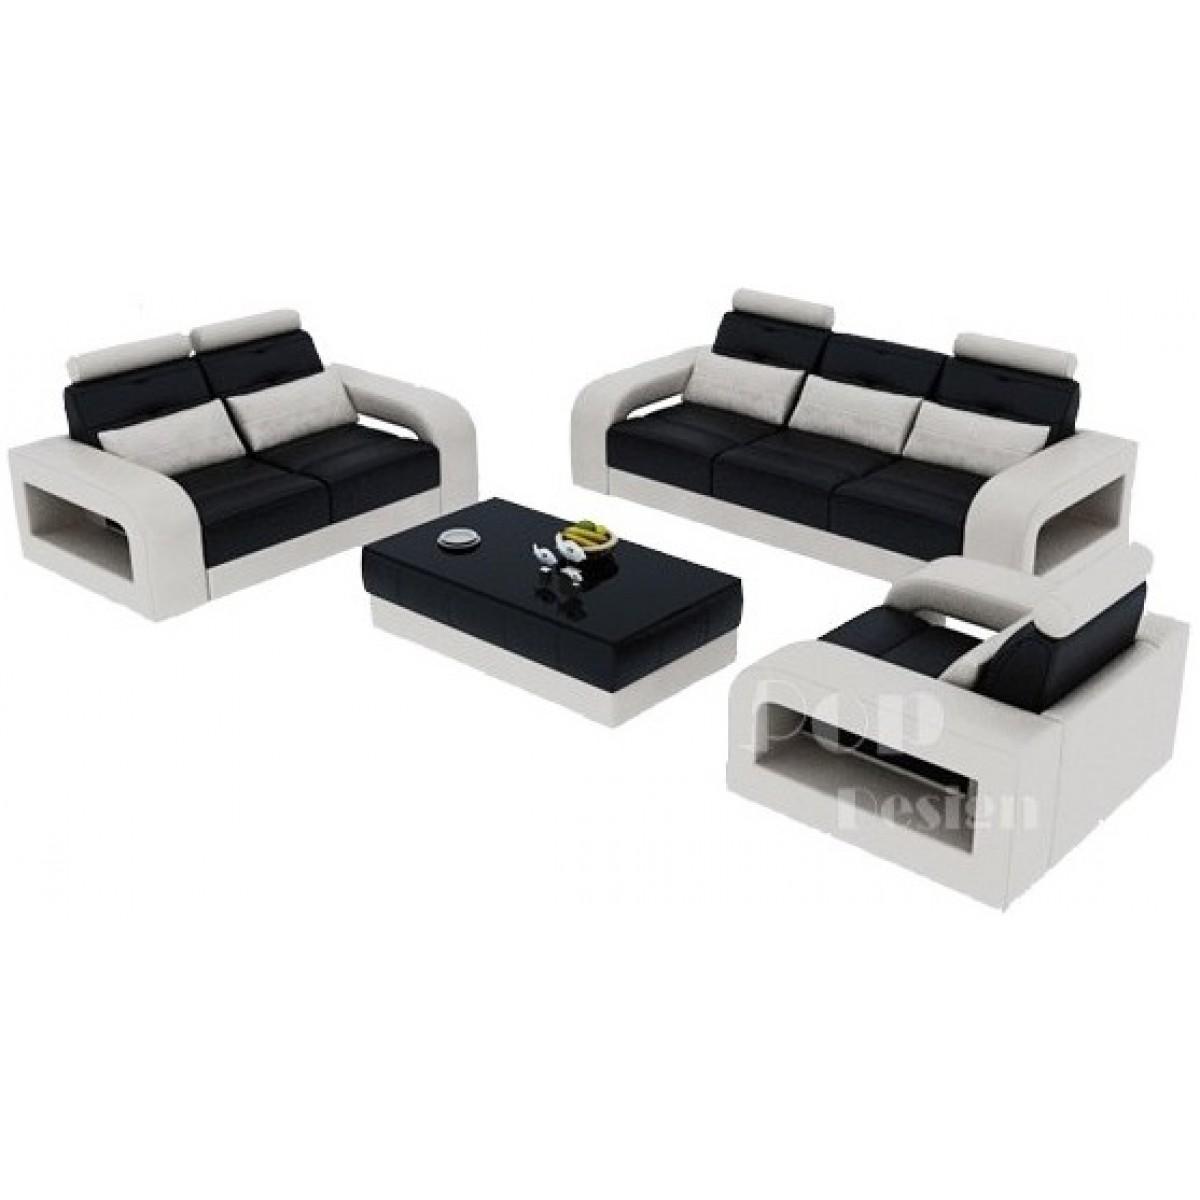 salon set canap s personnalisable en cuir design salerno. Black Bedroom Furniture Sets. Home Design Ideas